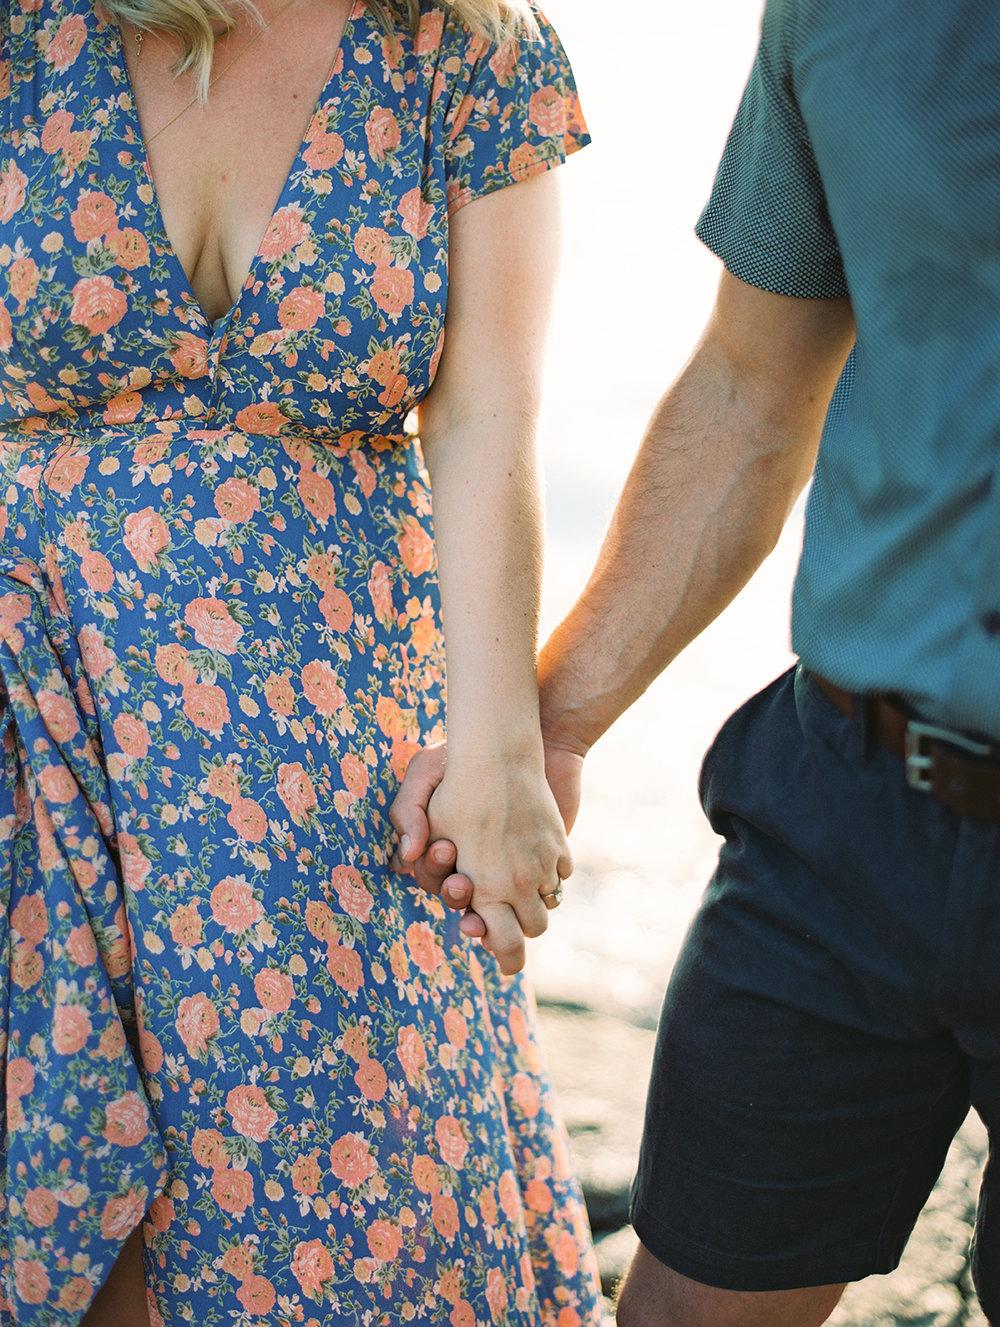 187-fine-art-film-photographer-wedding-engagement-jacob+cammye-destination-wedding-nicaragua-brumley & wells photography-rehearsal-dinner.jpg